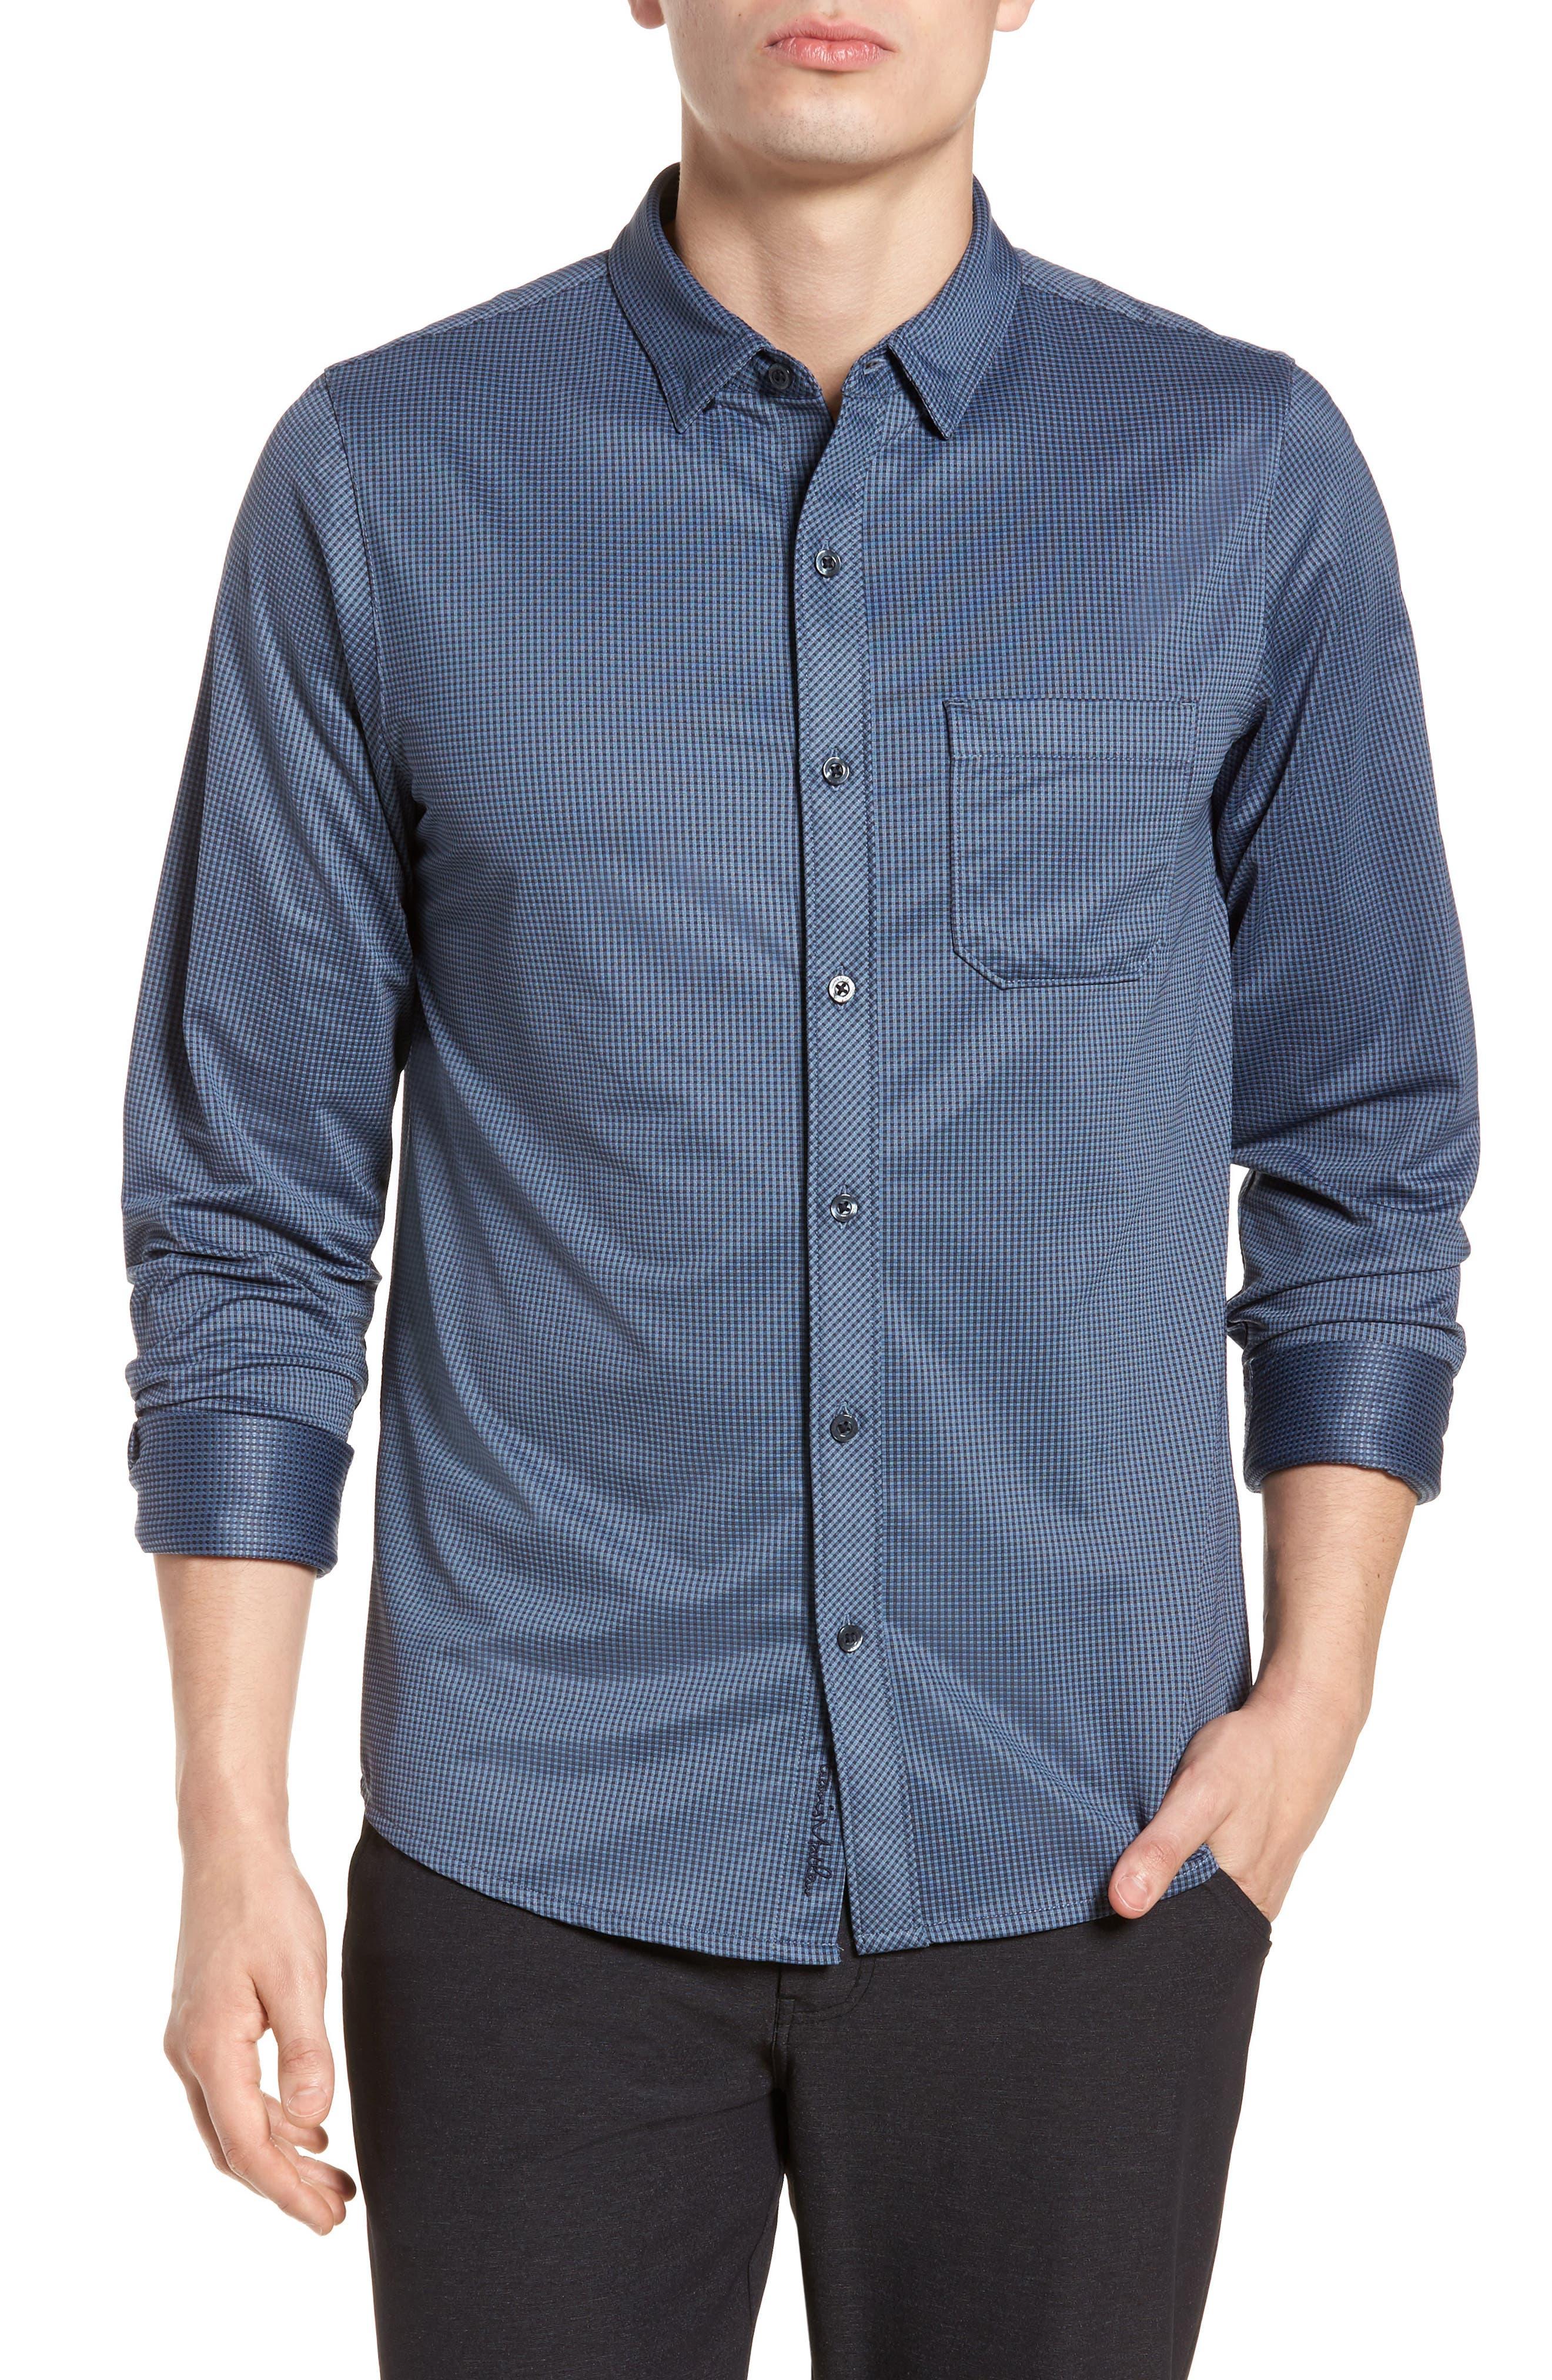 Travis Mathew Men's Casual Button-Down Shirts Clothing | Nordstrom